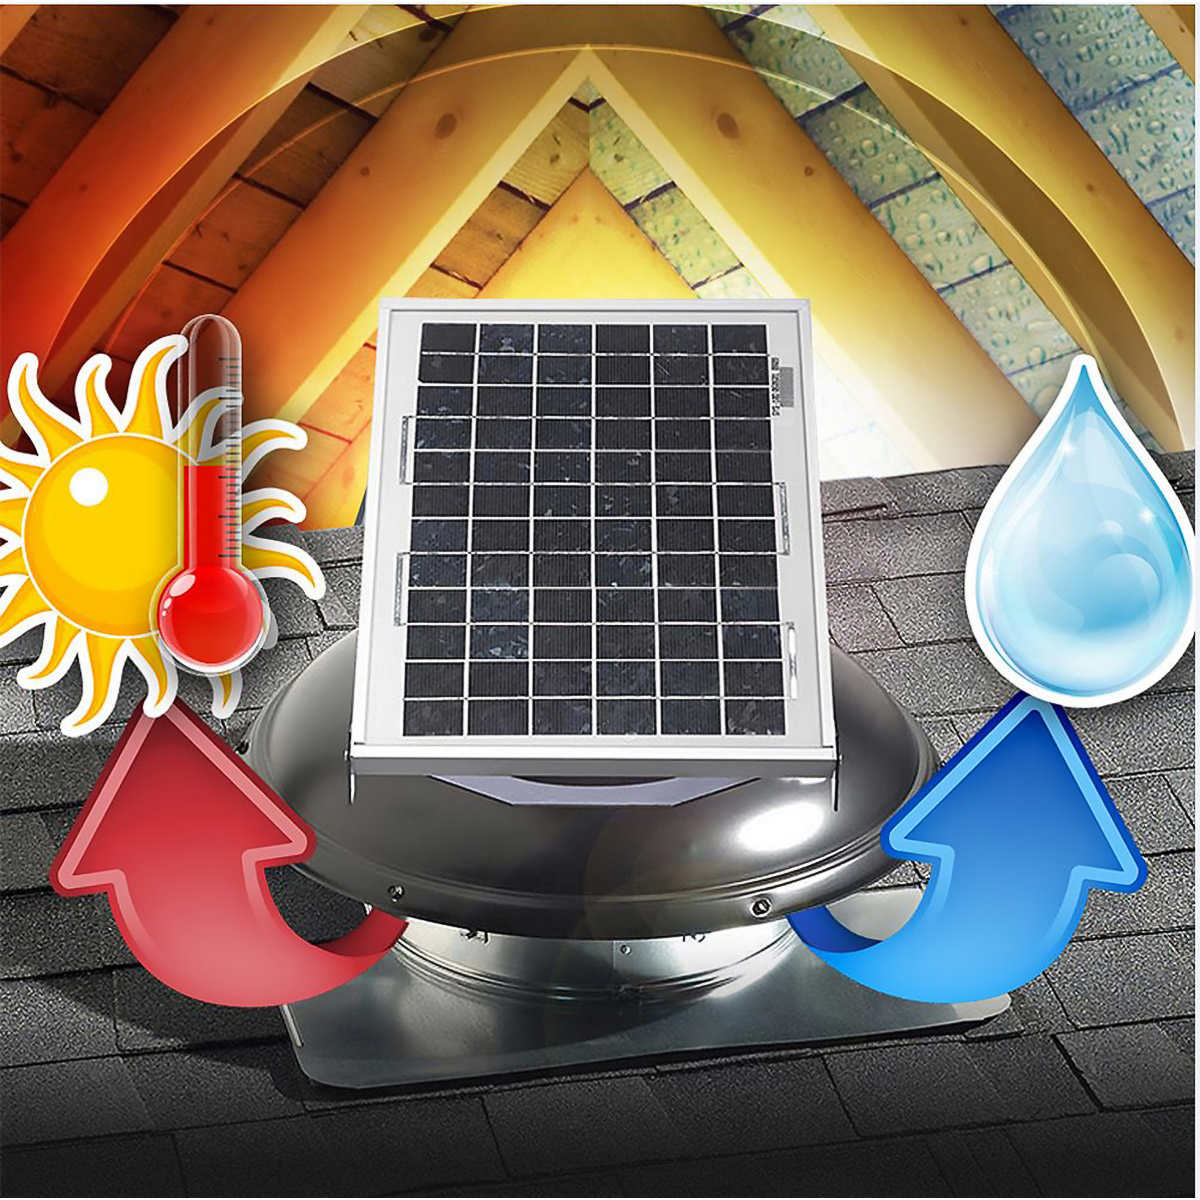 Solar Attic Fan, Ventilates 1,200 sq  ft